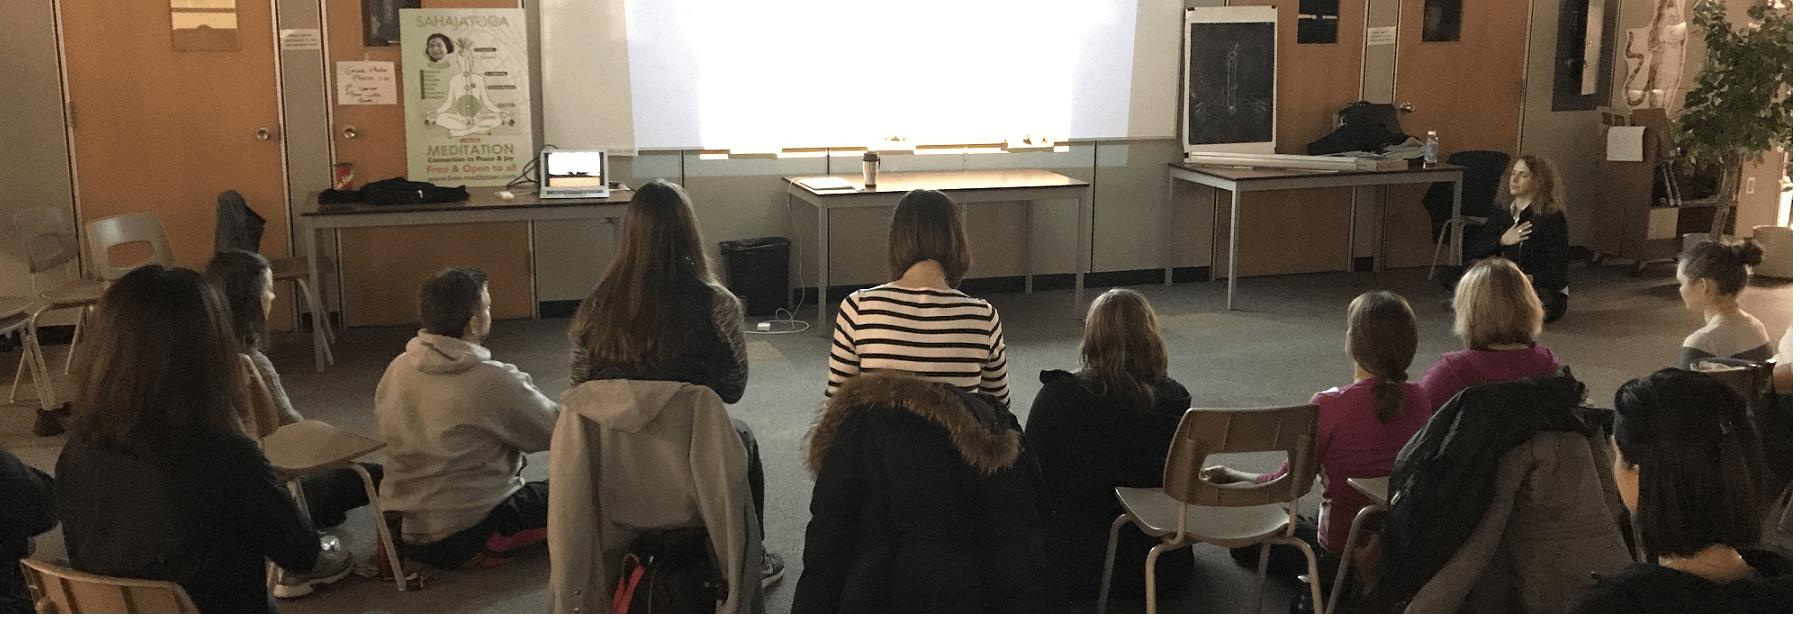 A Teacher's Thank You Letter and Feedback about Sahaja Yoga Meditation Experience